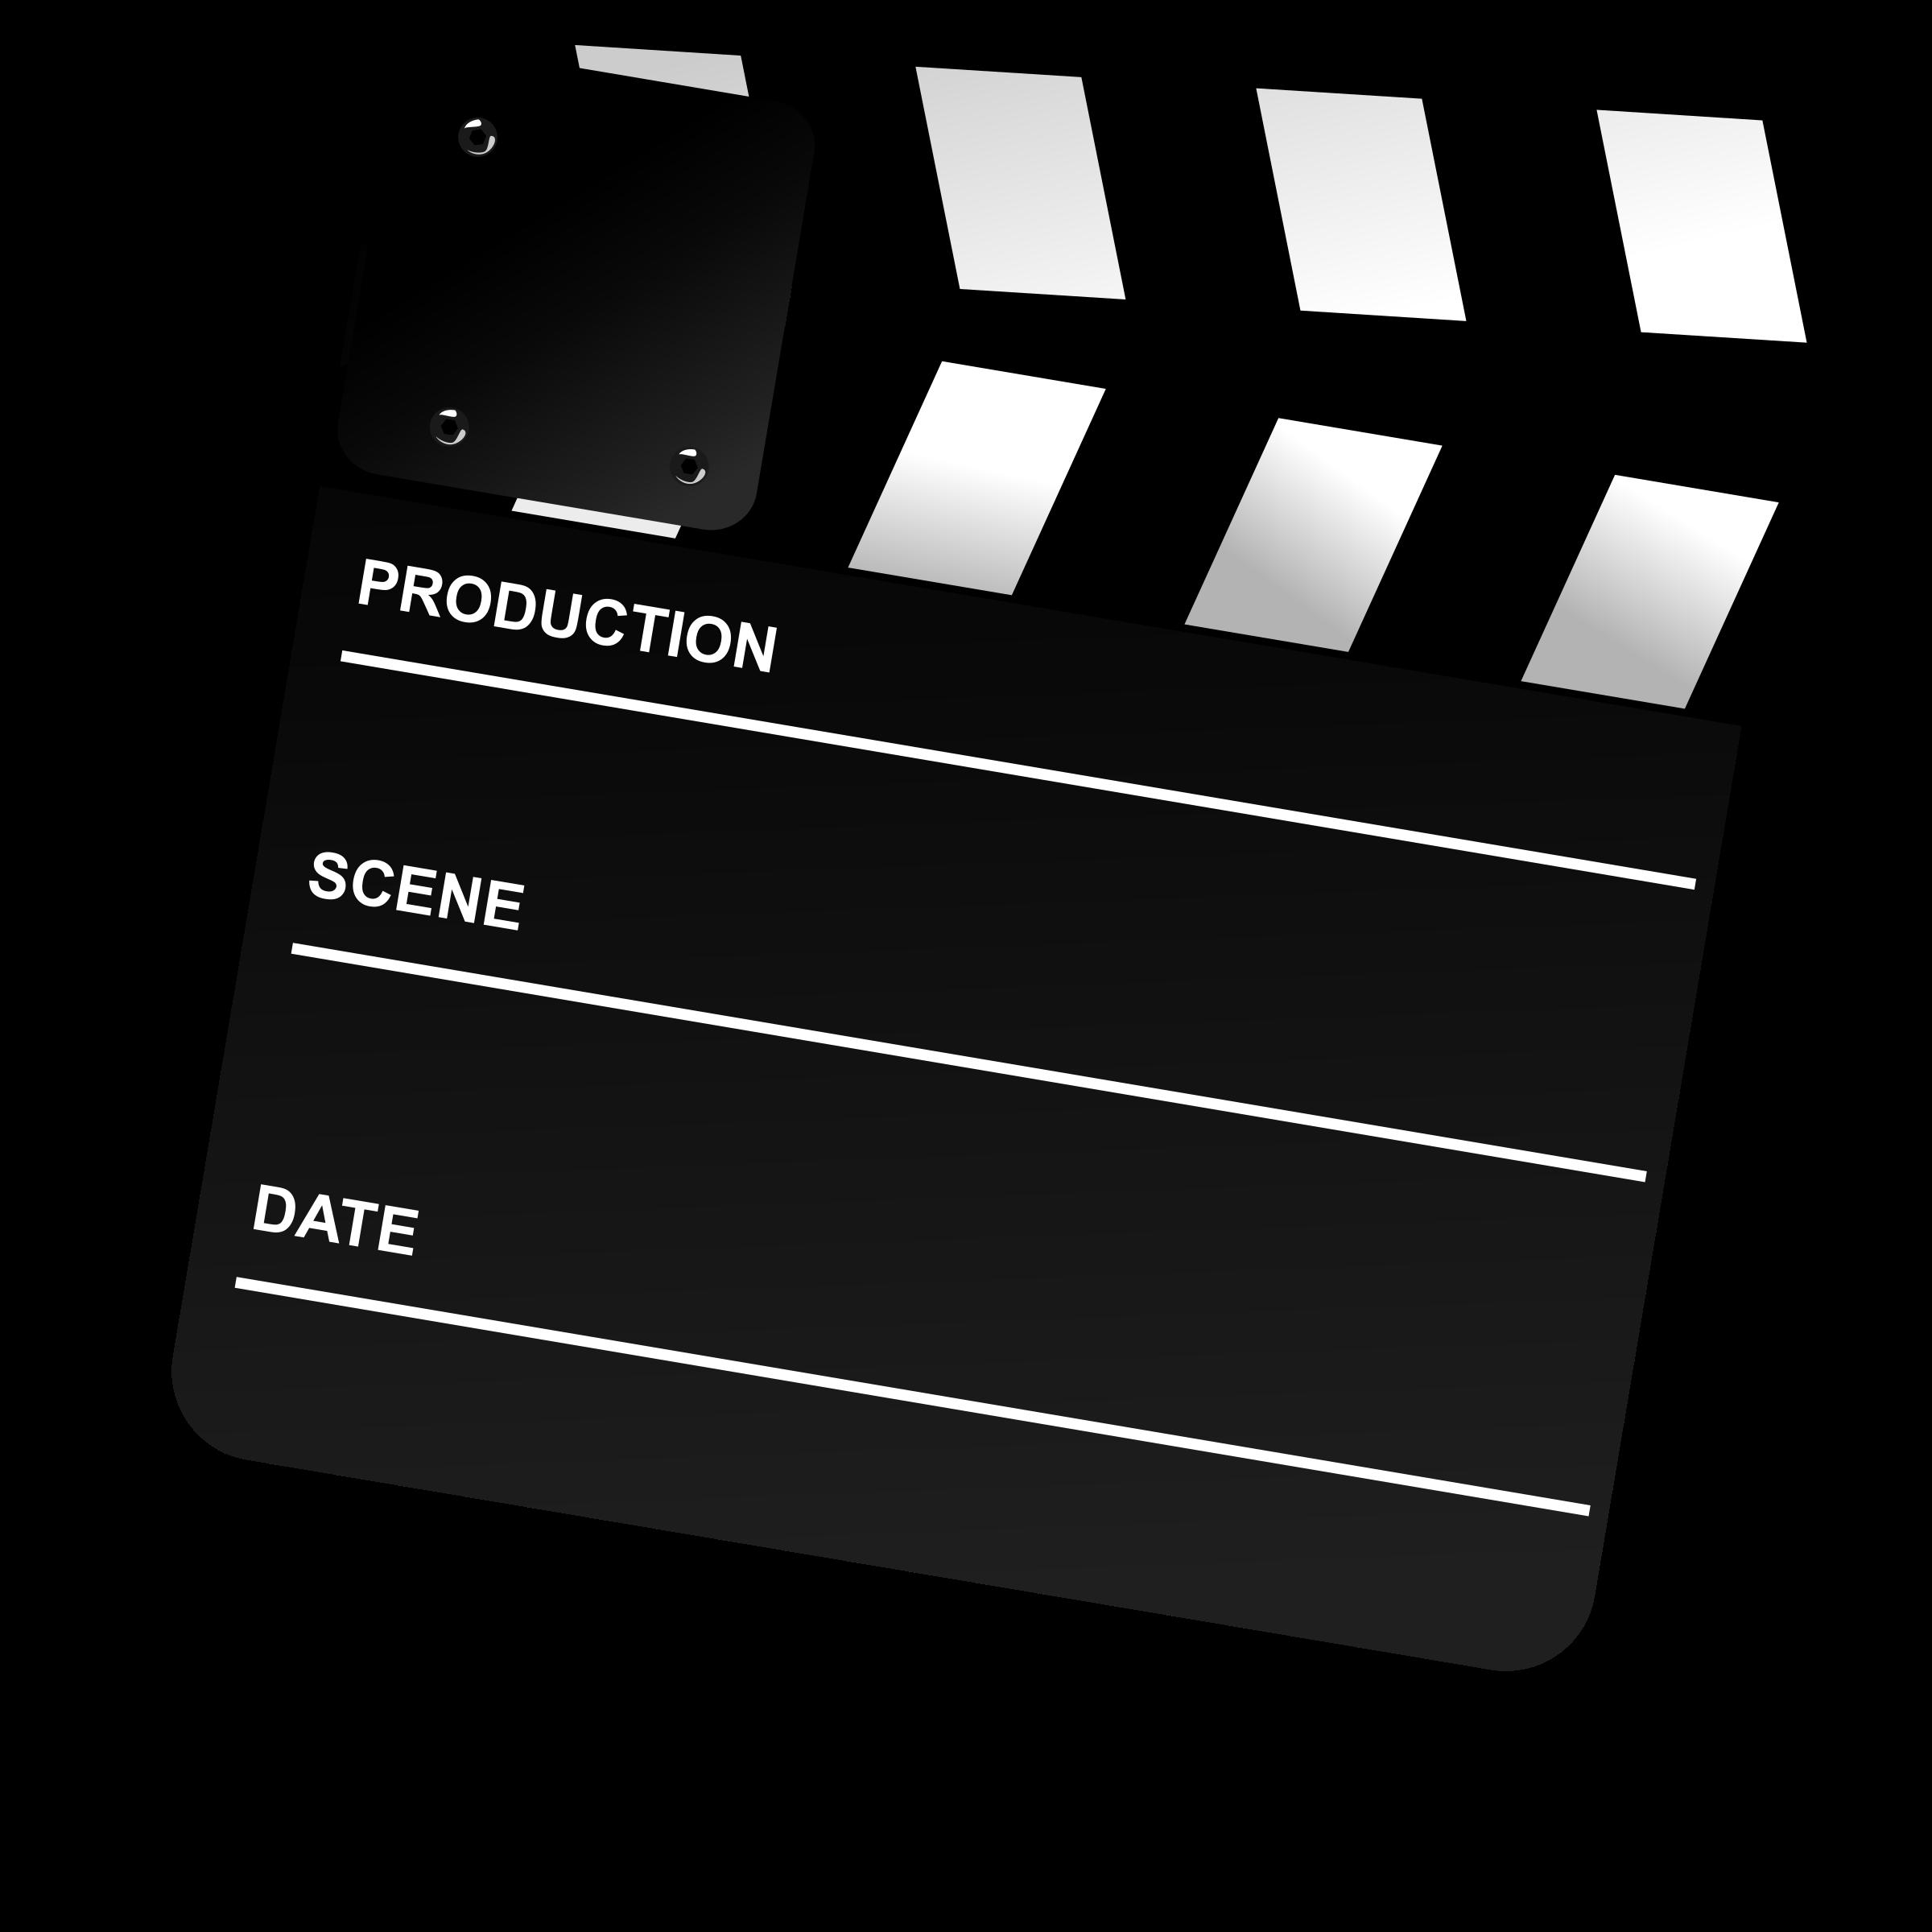 Movie clipart movie director. Clapper board big image